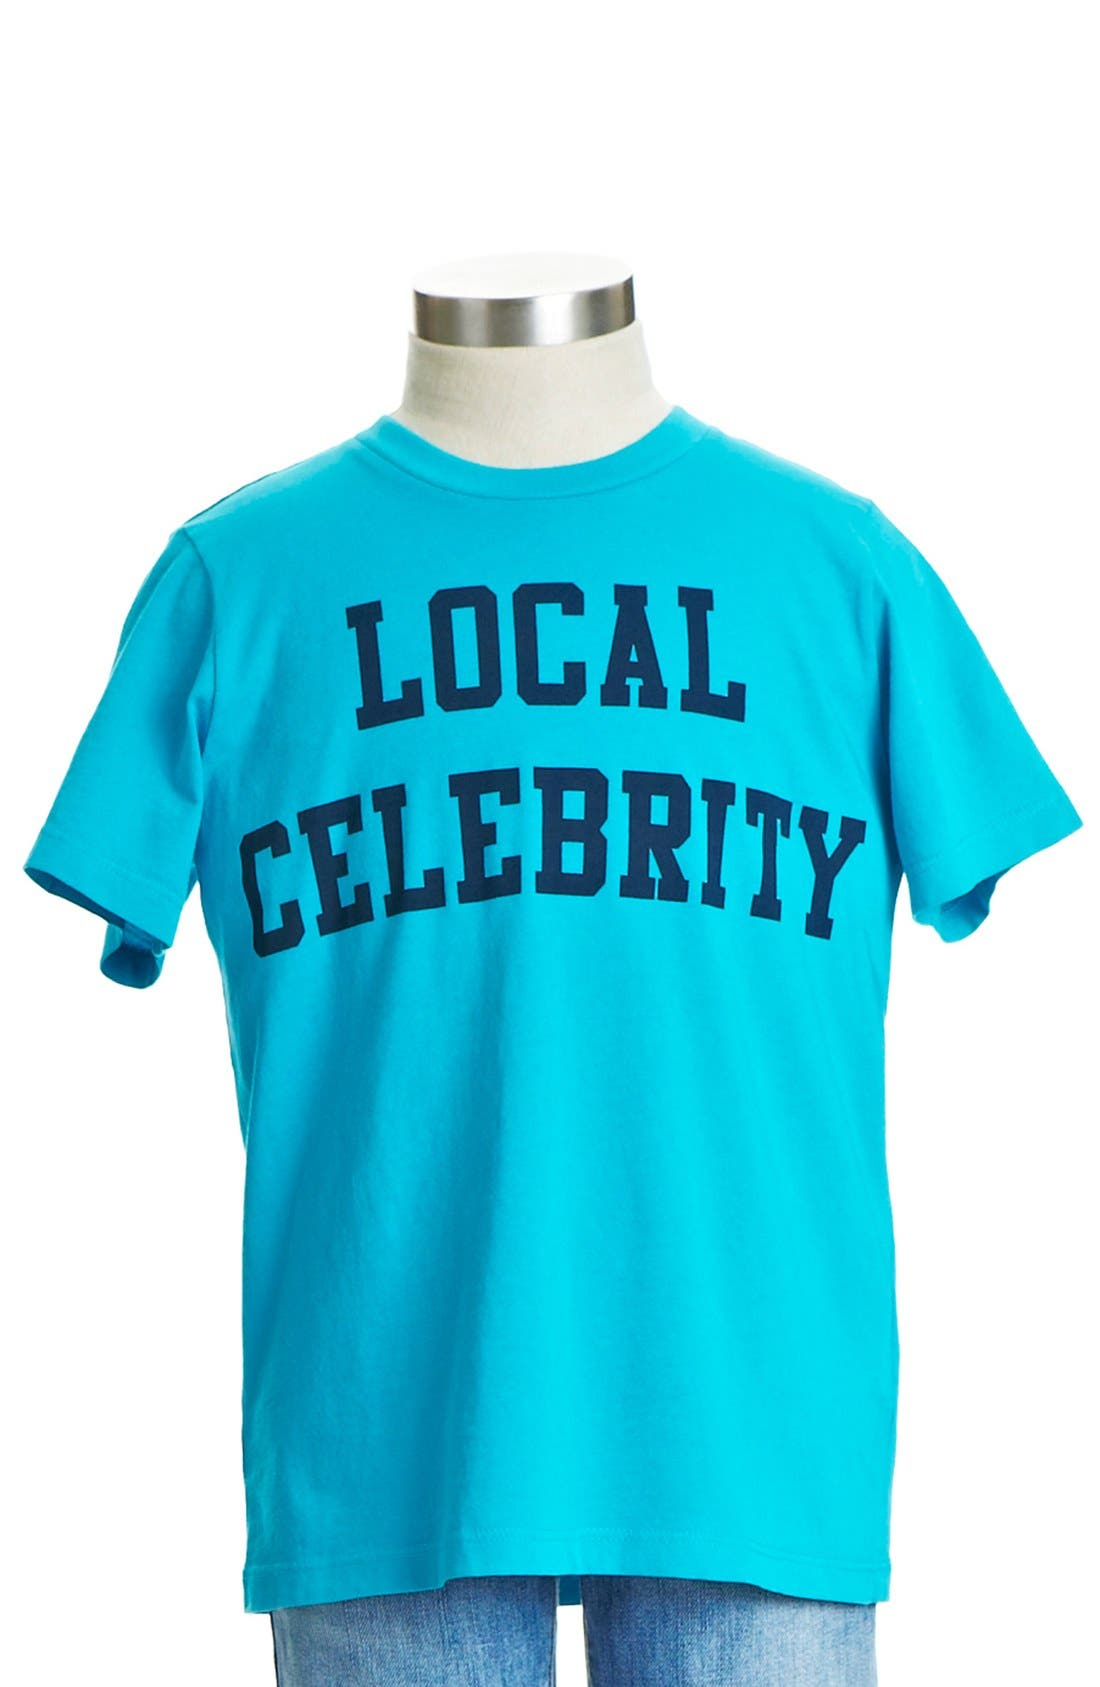 Alternate Image 1 Selected - Peek 'Local Celebrity' T-Shirt (Toddler Boys, Little Boys & Big Boys)